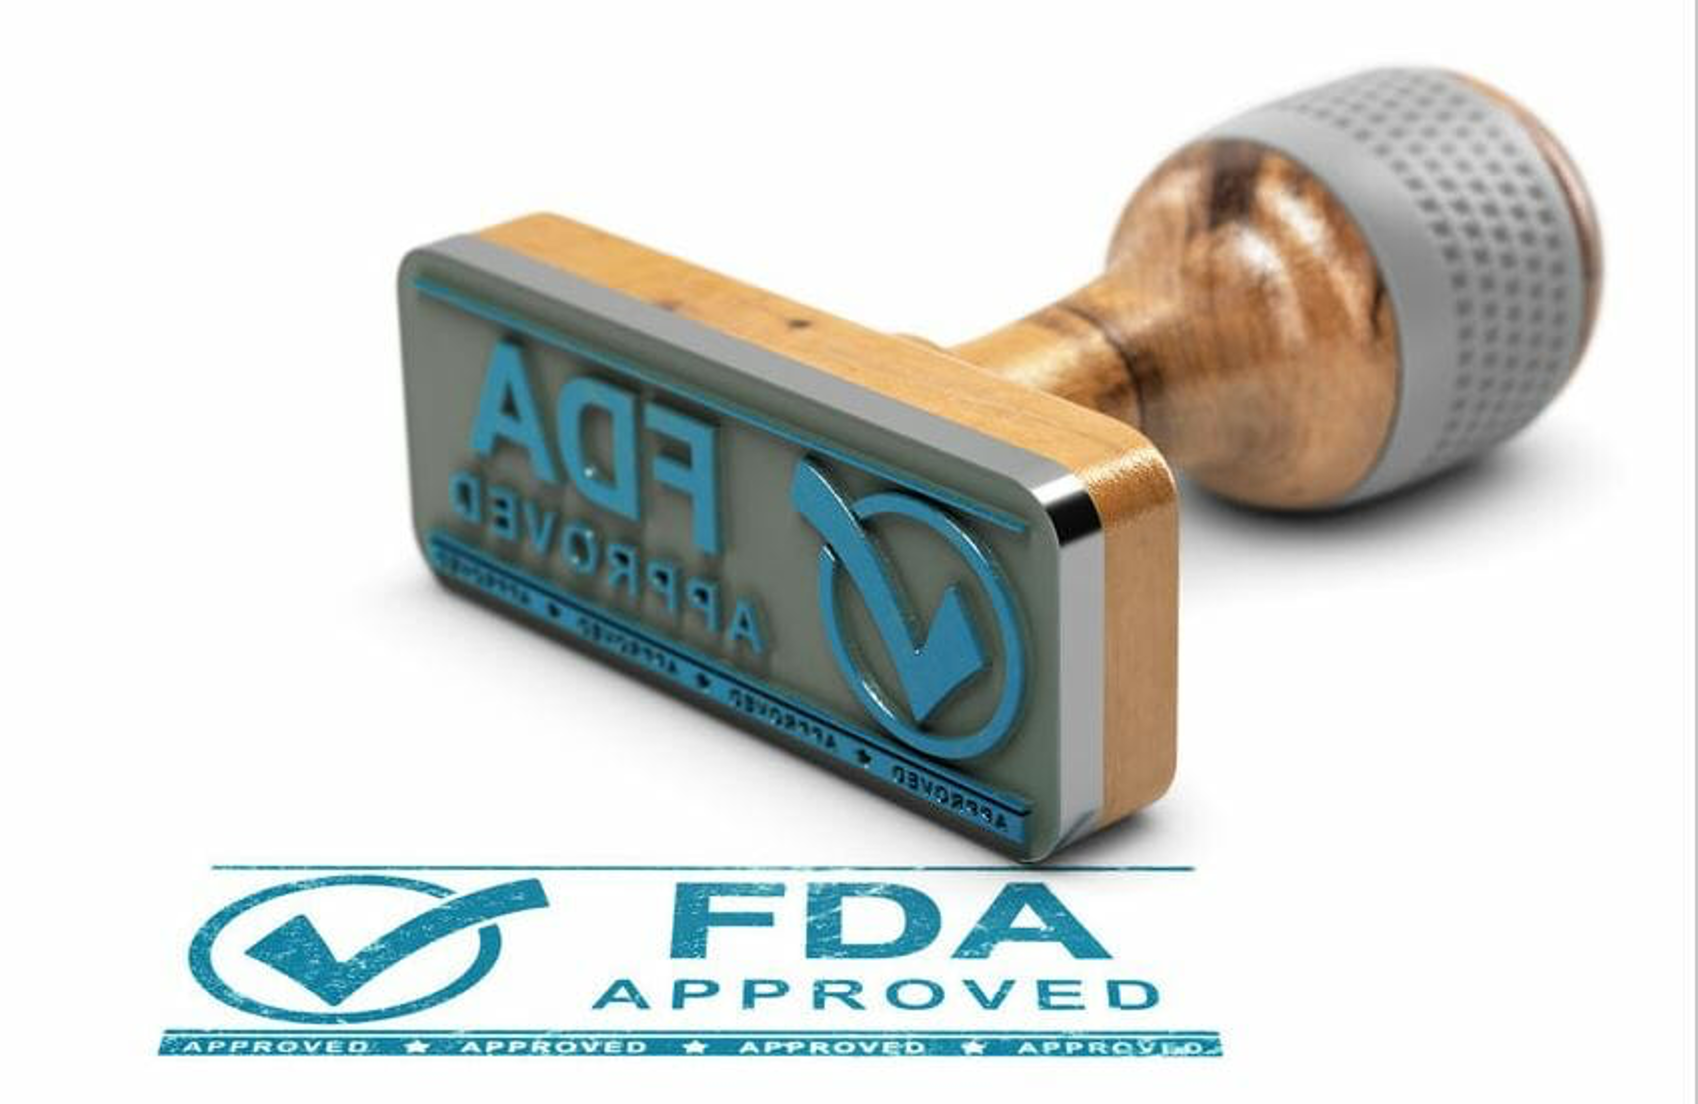 FDA (Food Drug Administration) minősítés